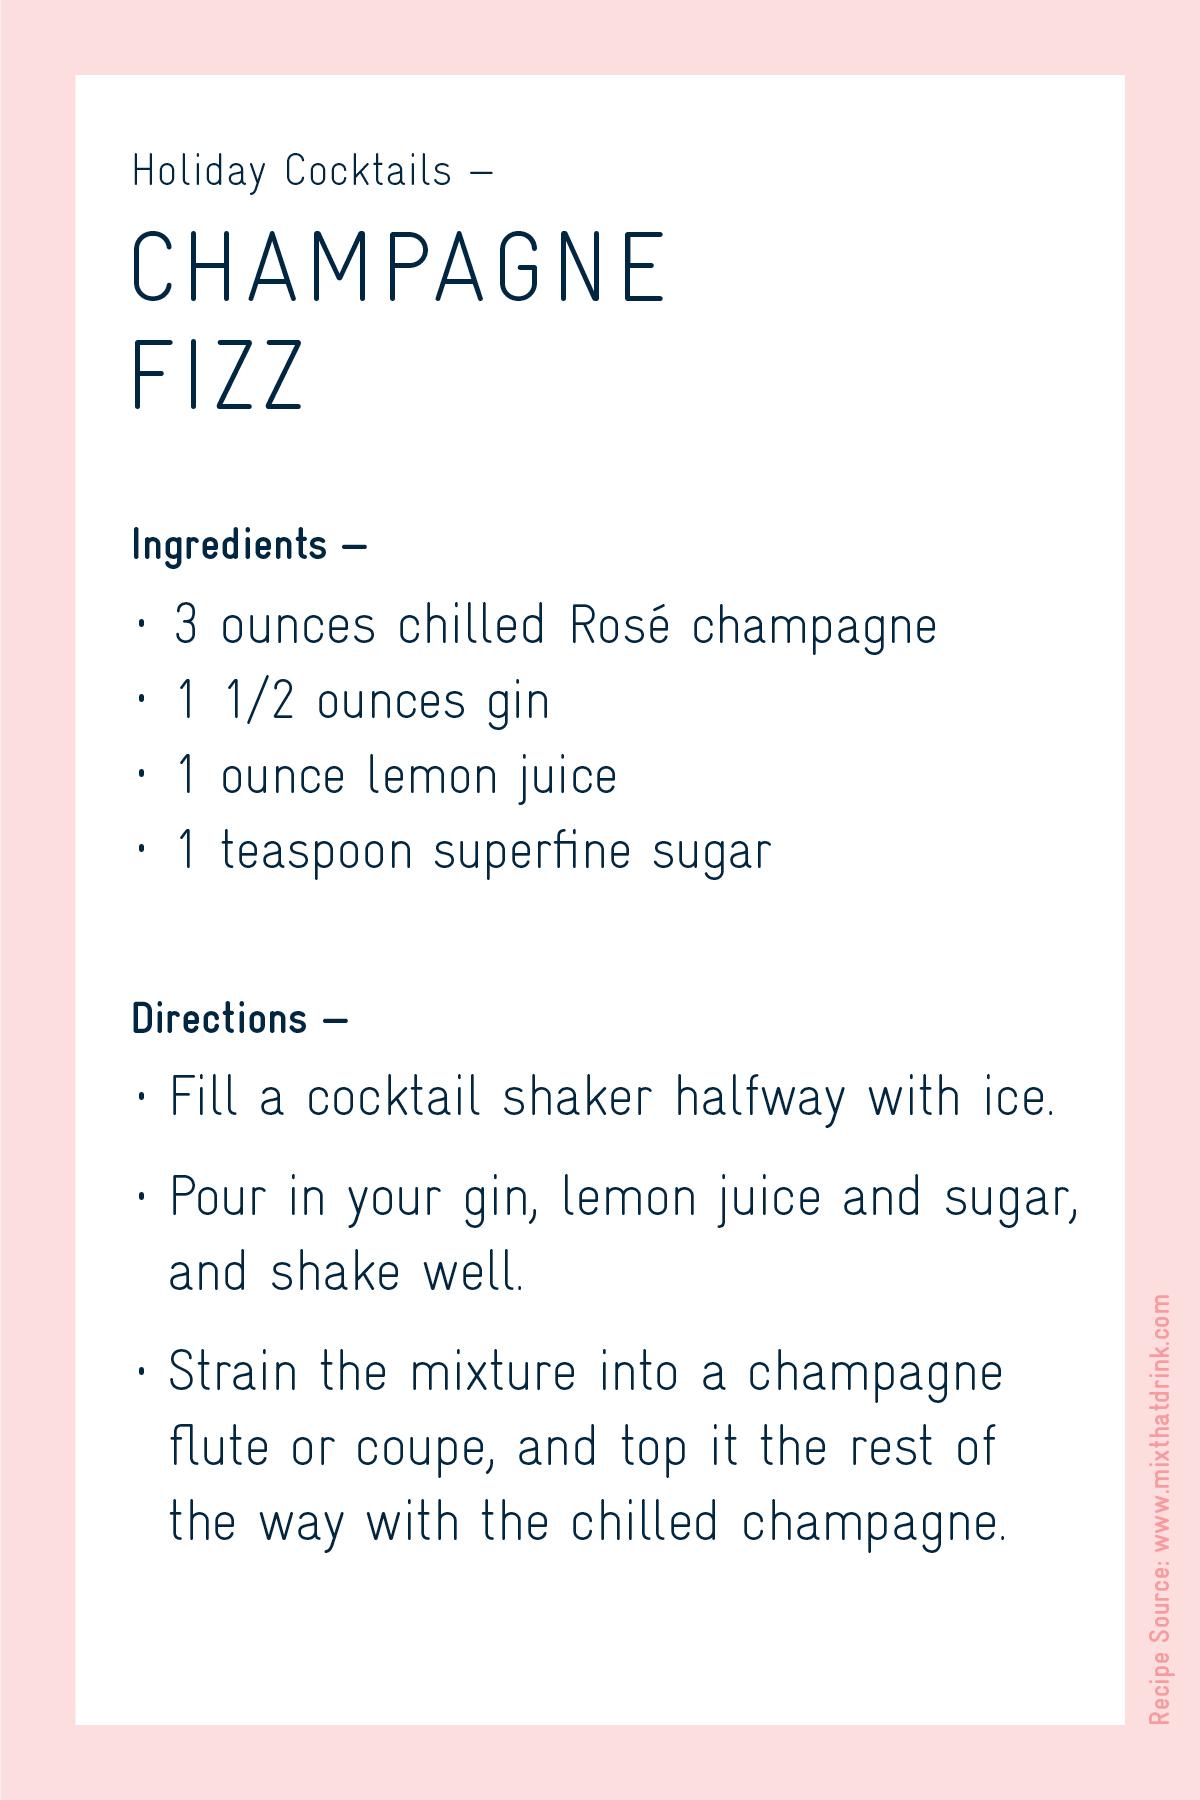 Champagne_RecipeSingle.jpg